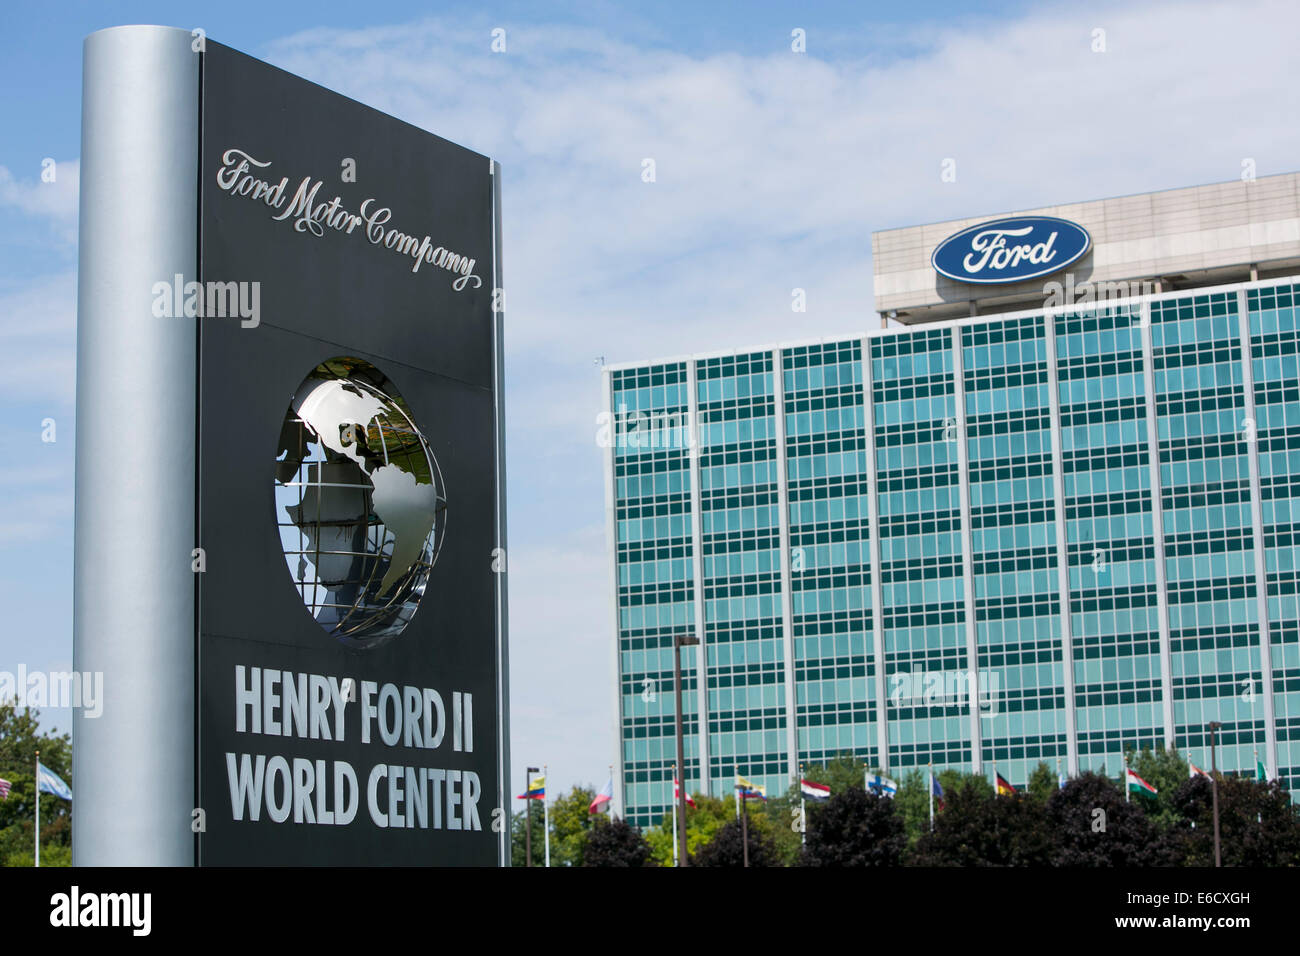 Der Sitz der Ford Motor Company in Dearborn, Michigan. Stockbild